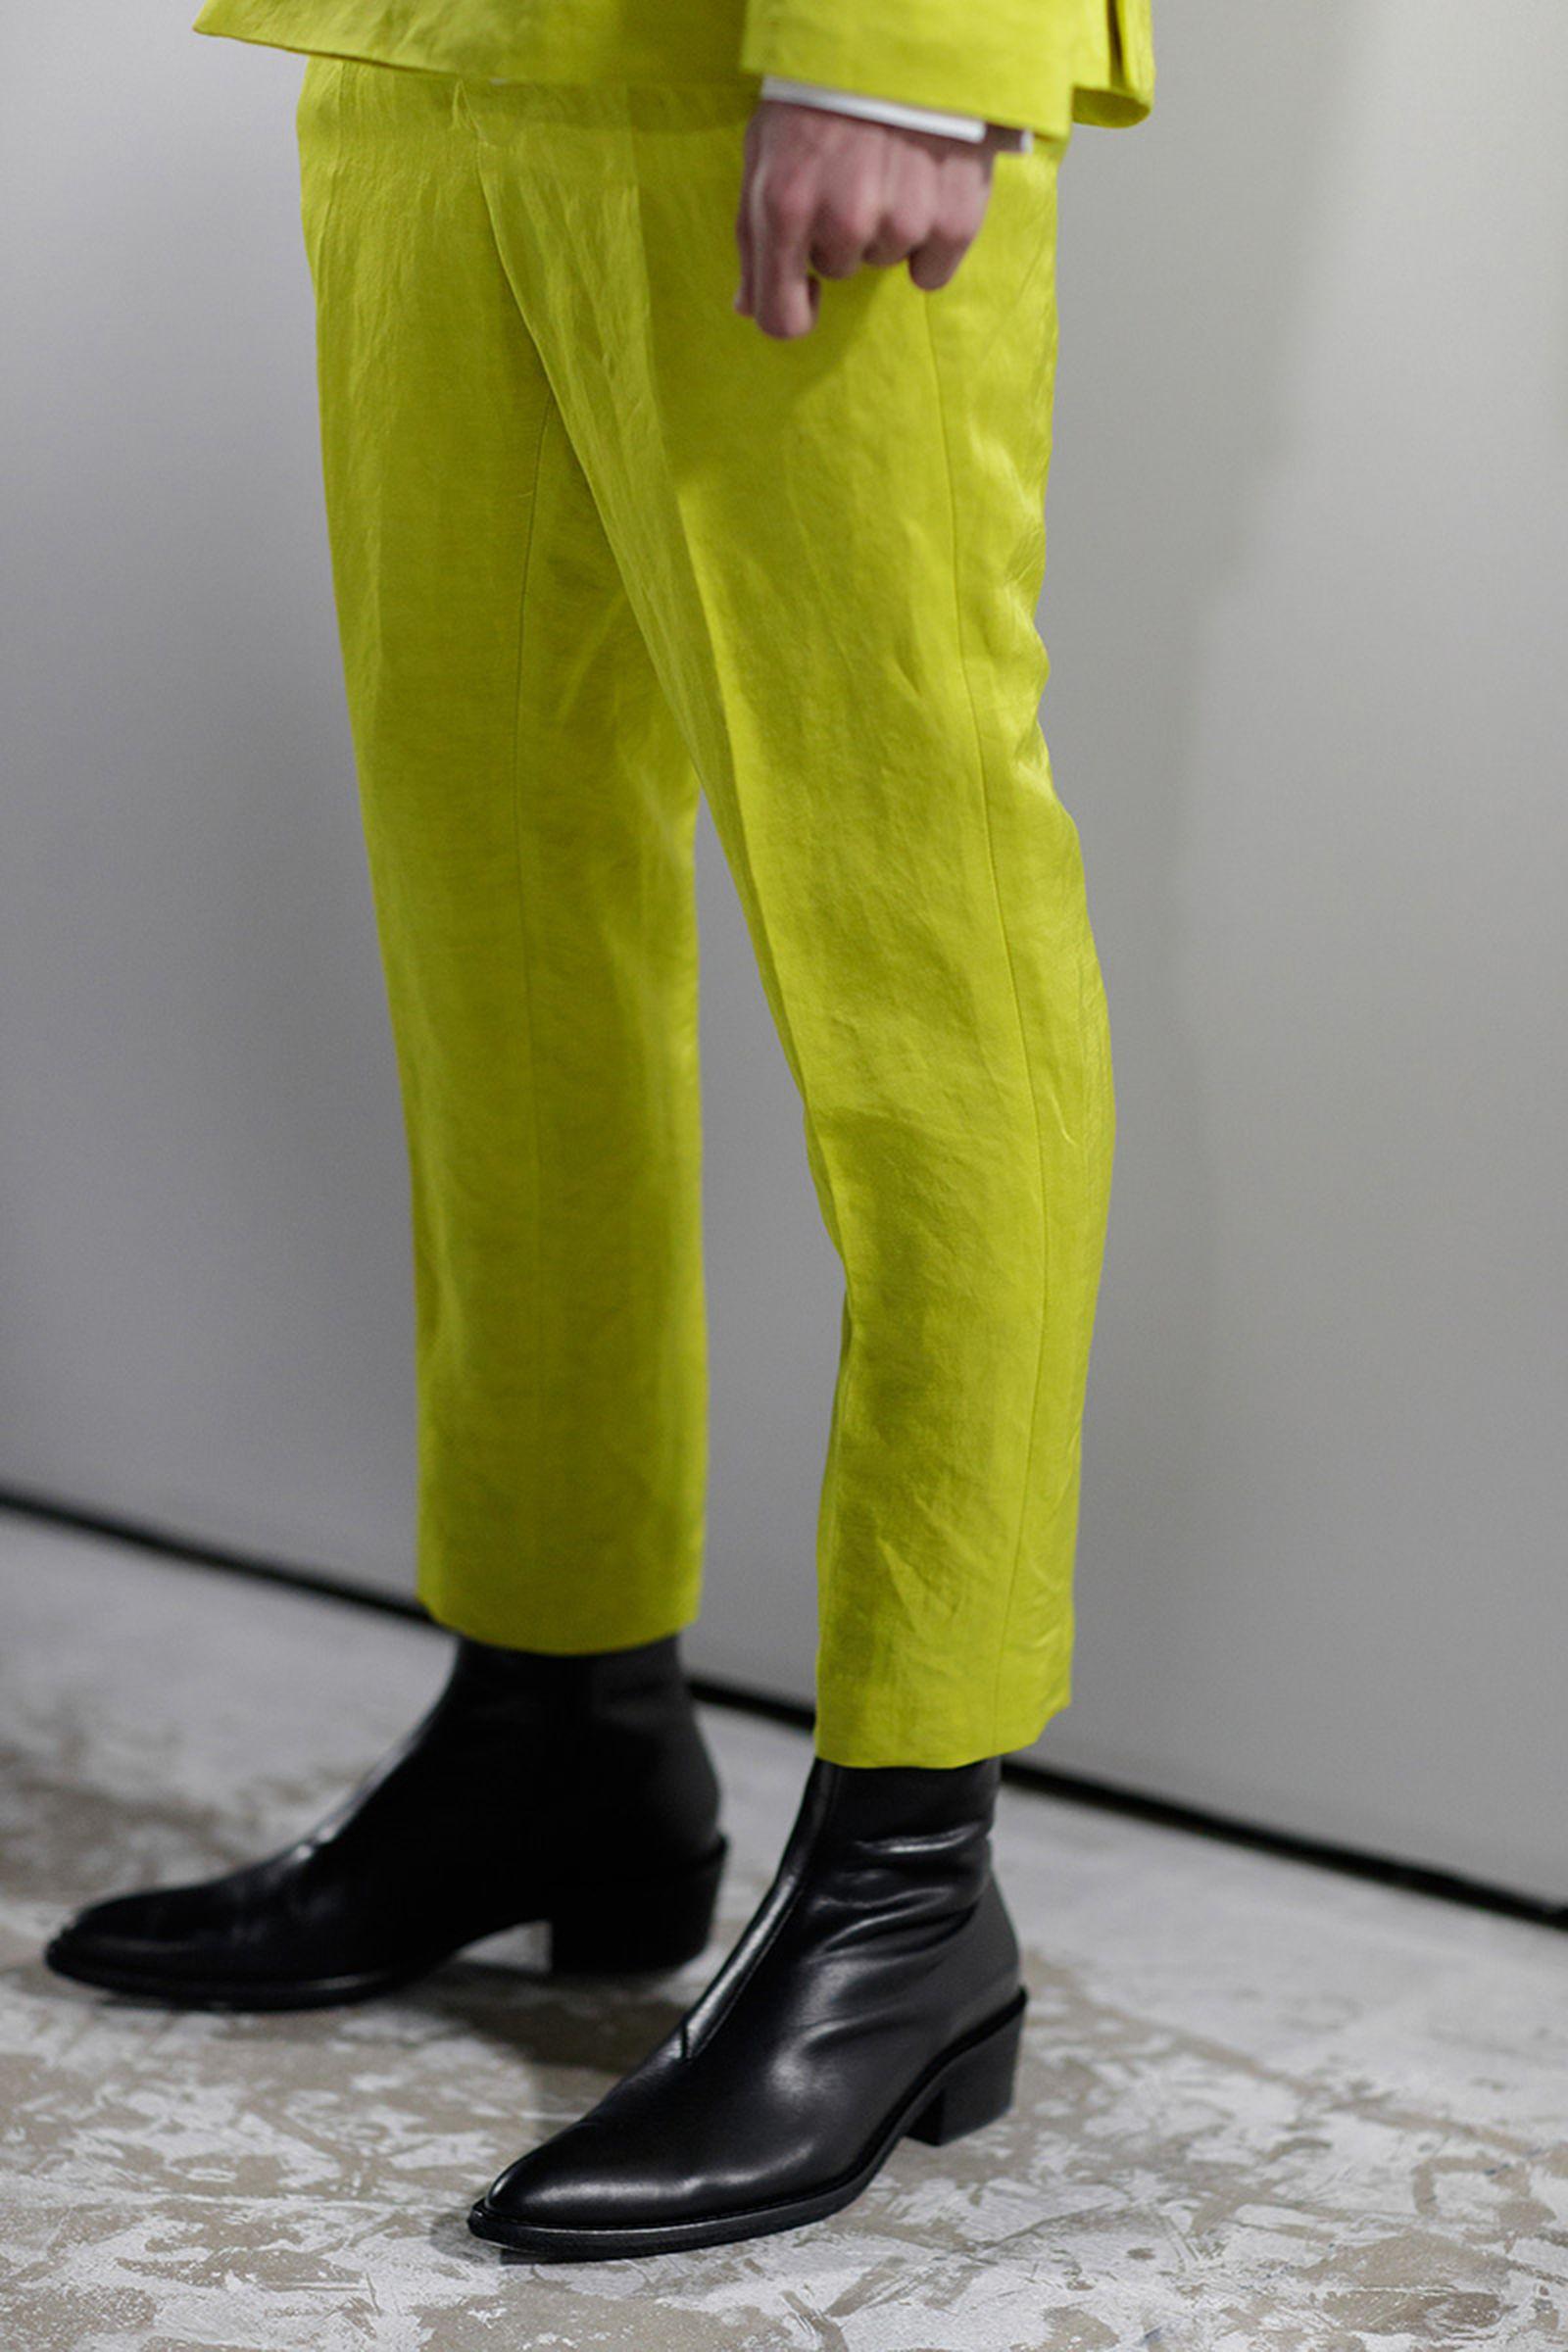 ss19 fashion week no sneakers Balenciaga Gucci Maison Margiela